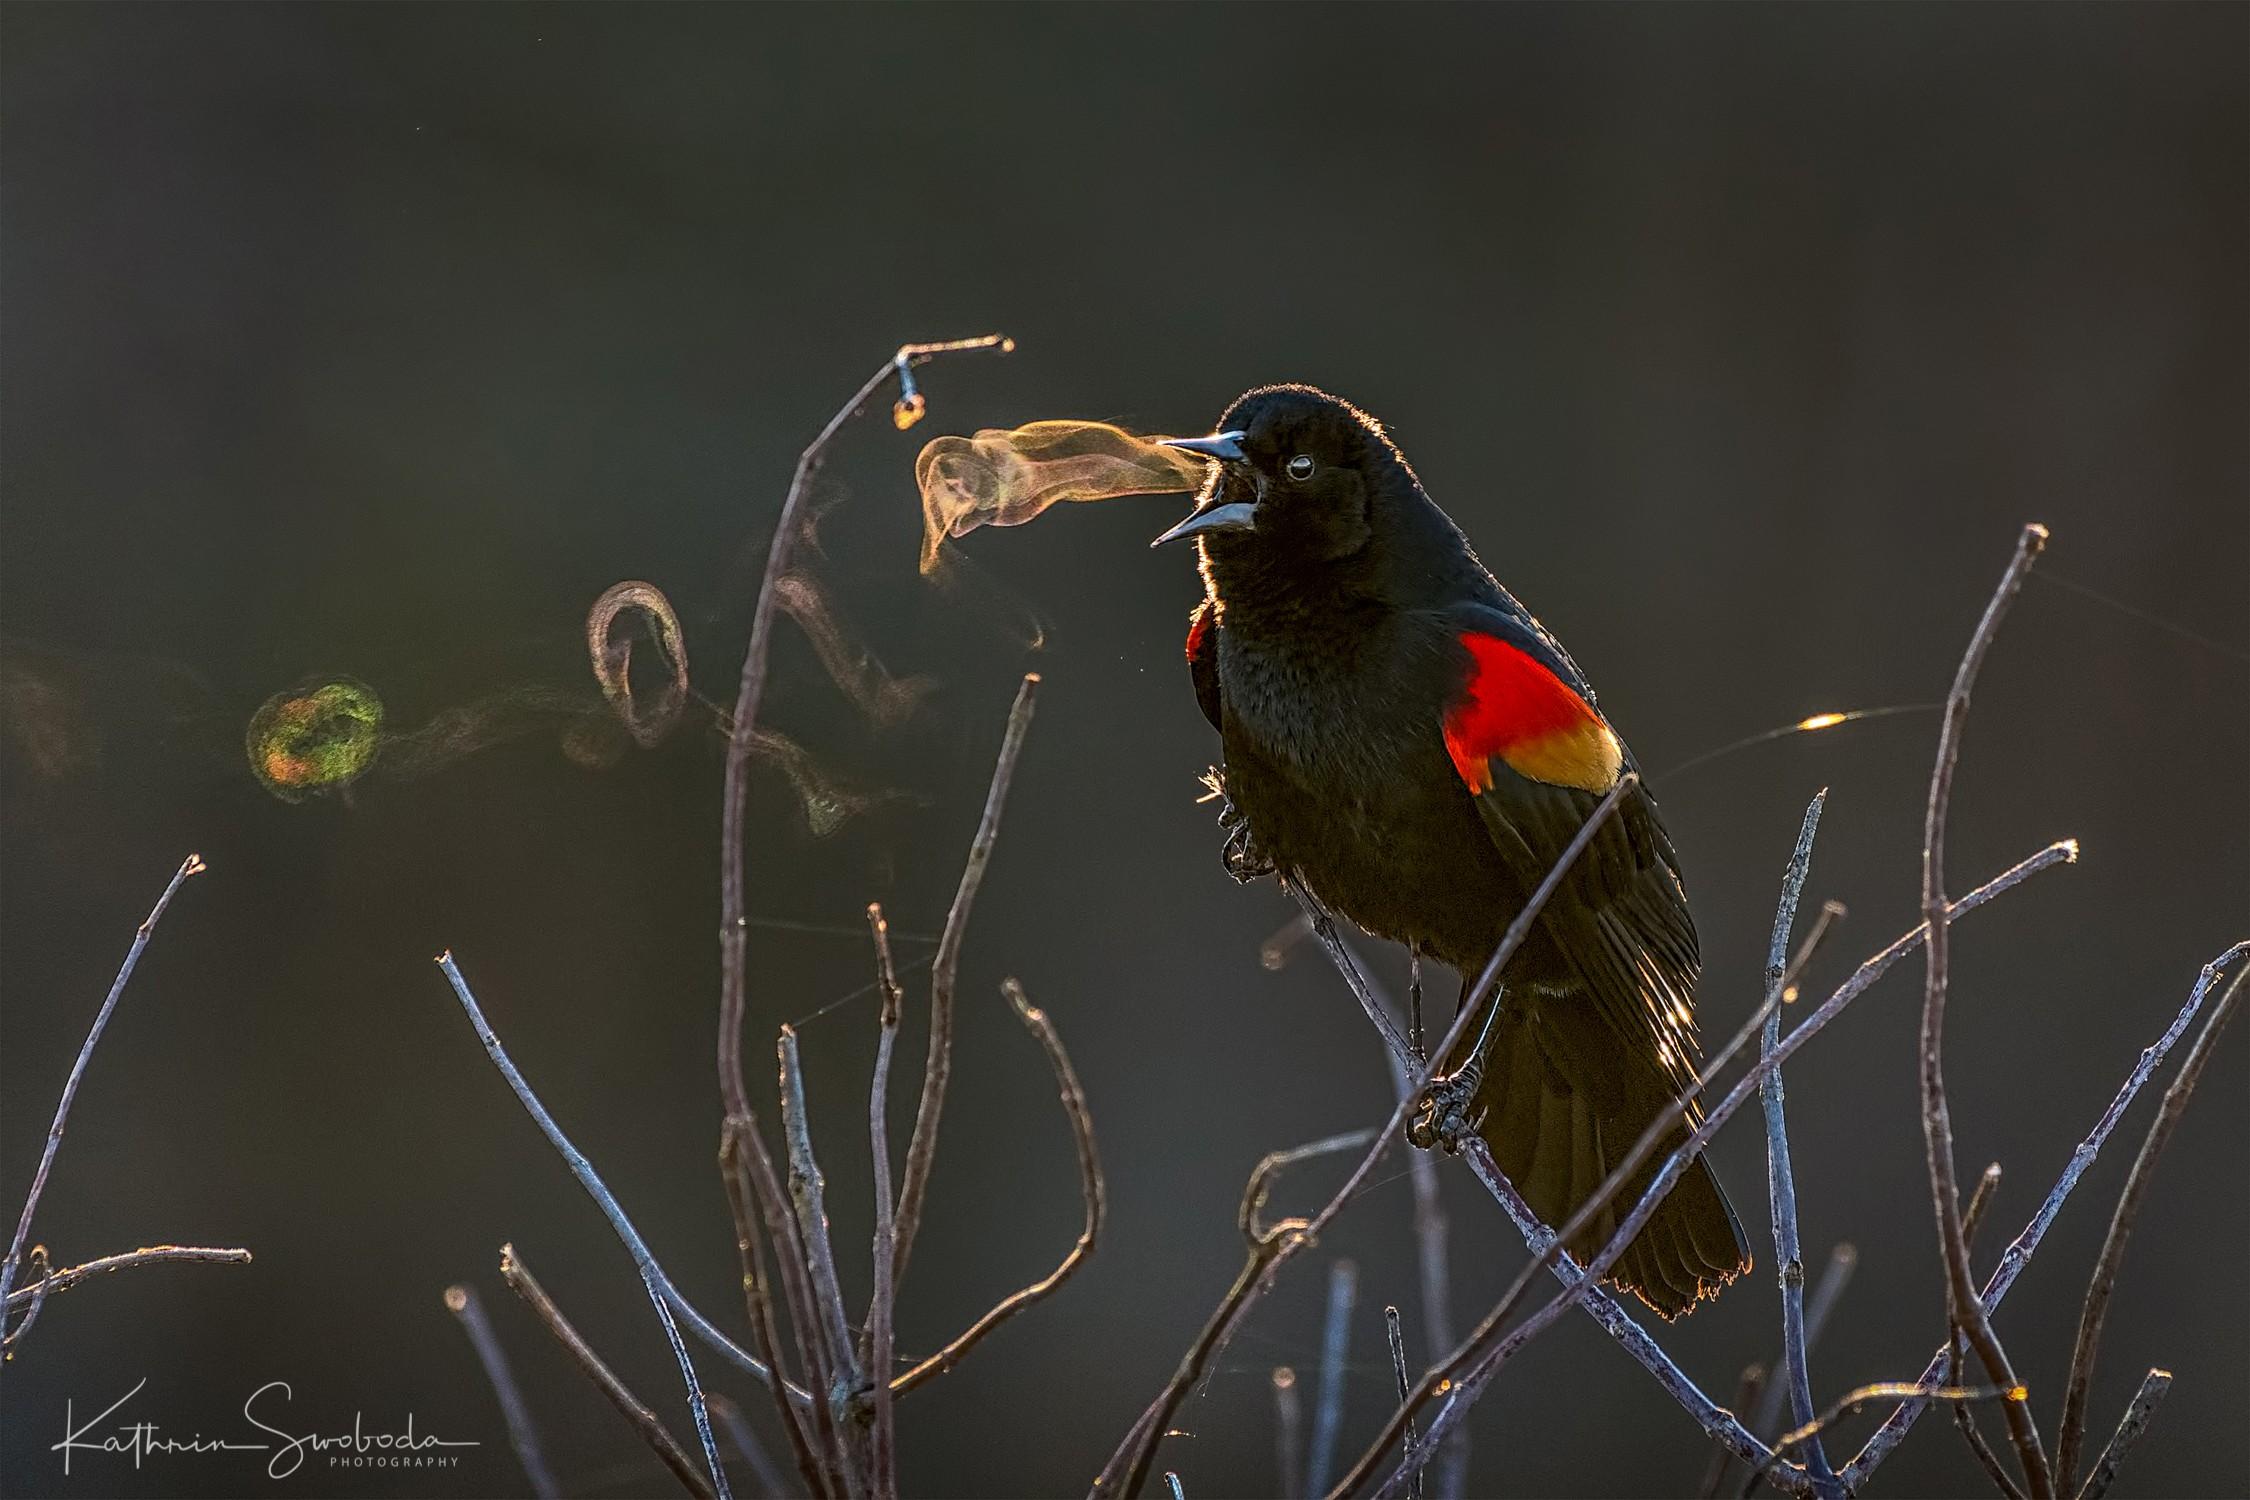 2019 Audubon Grand Prize Winner